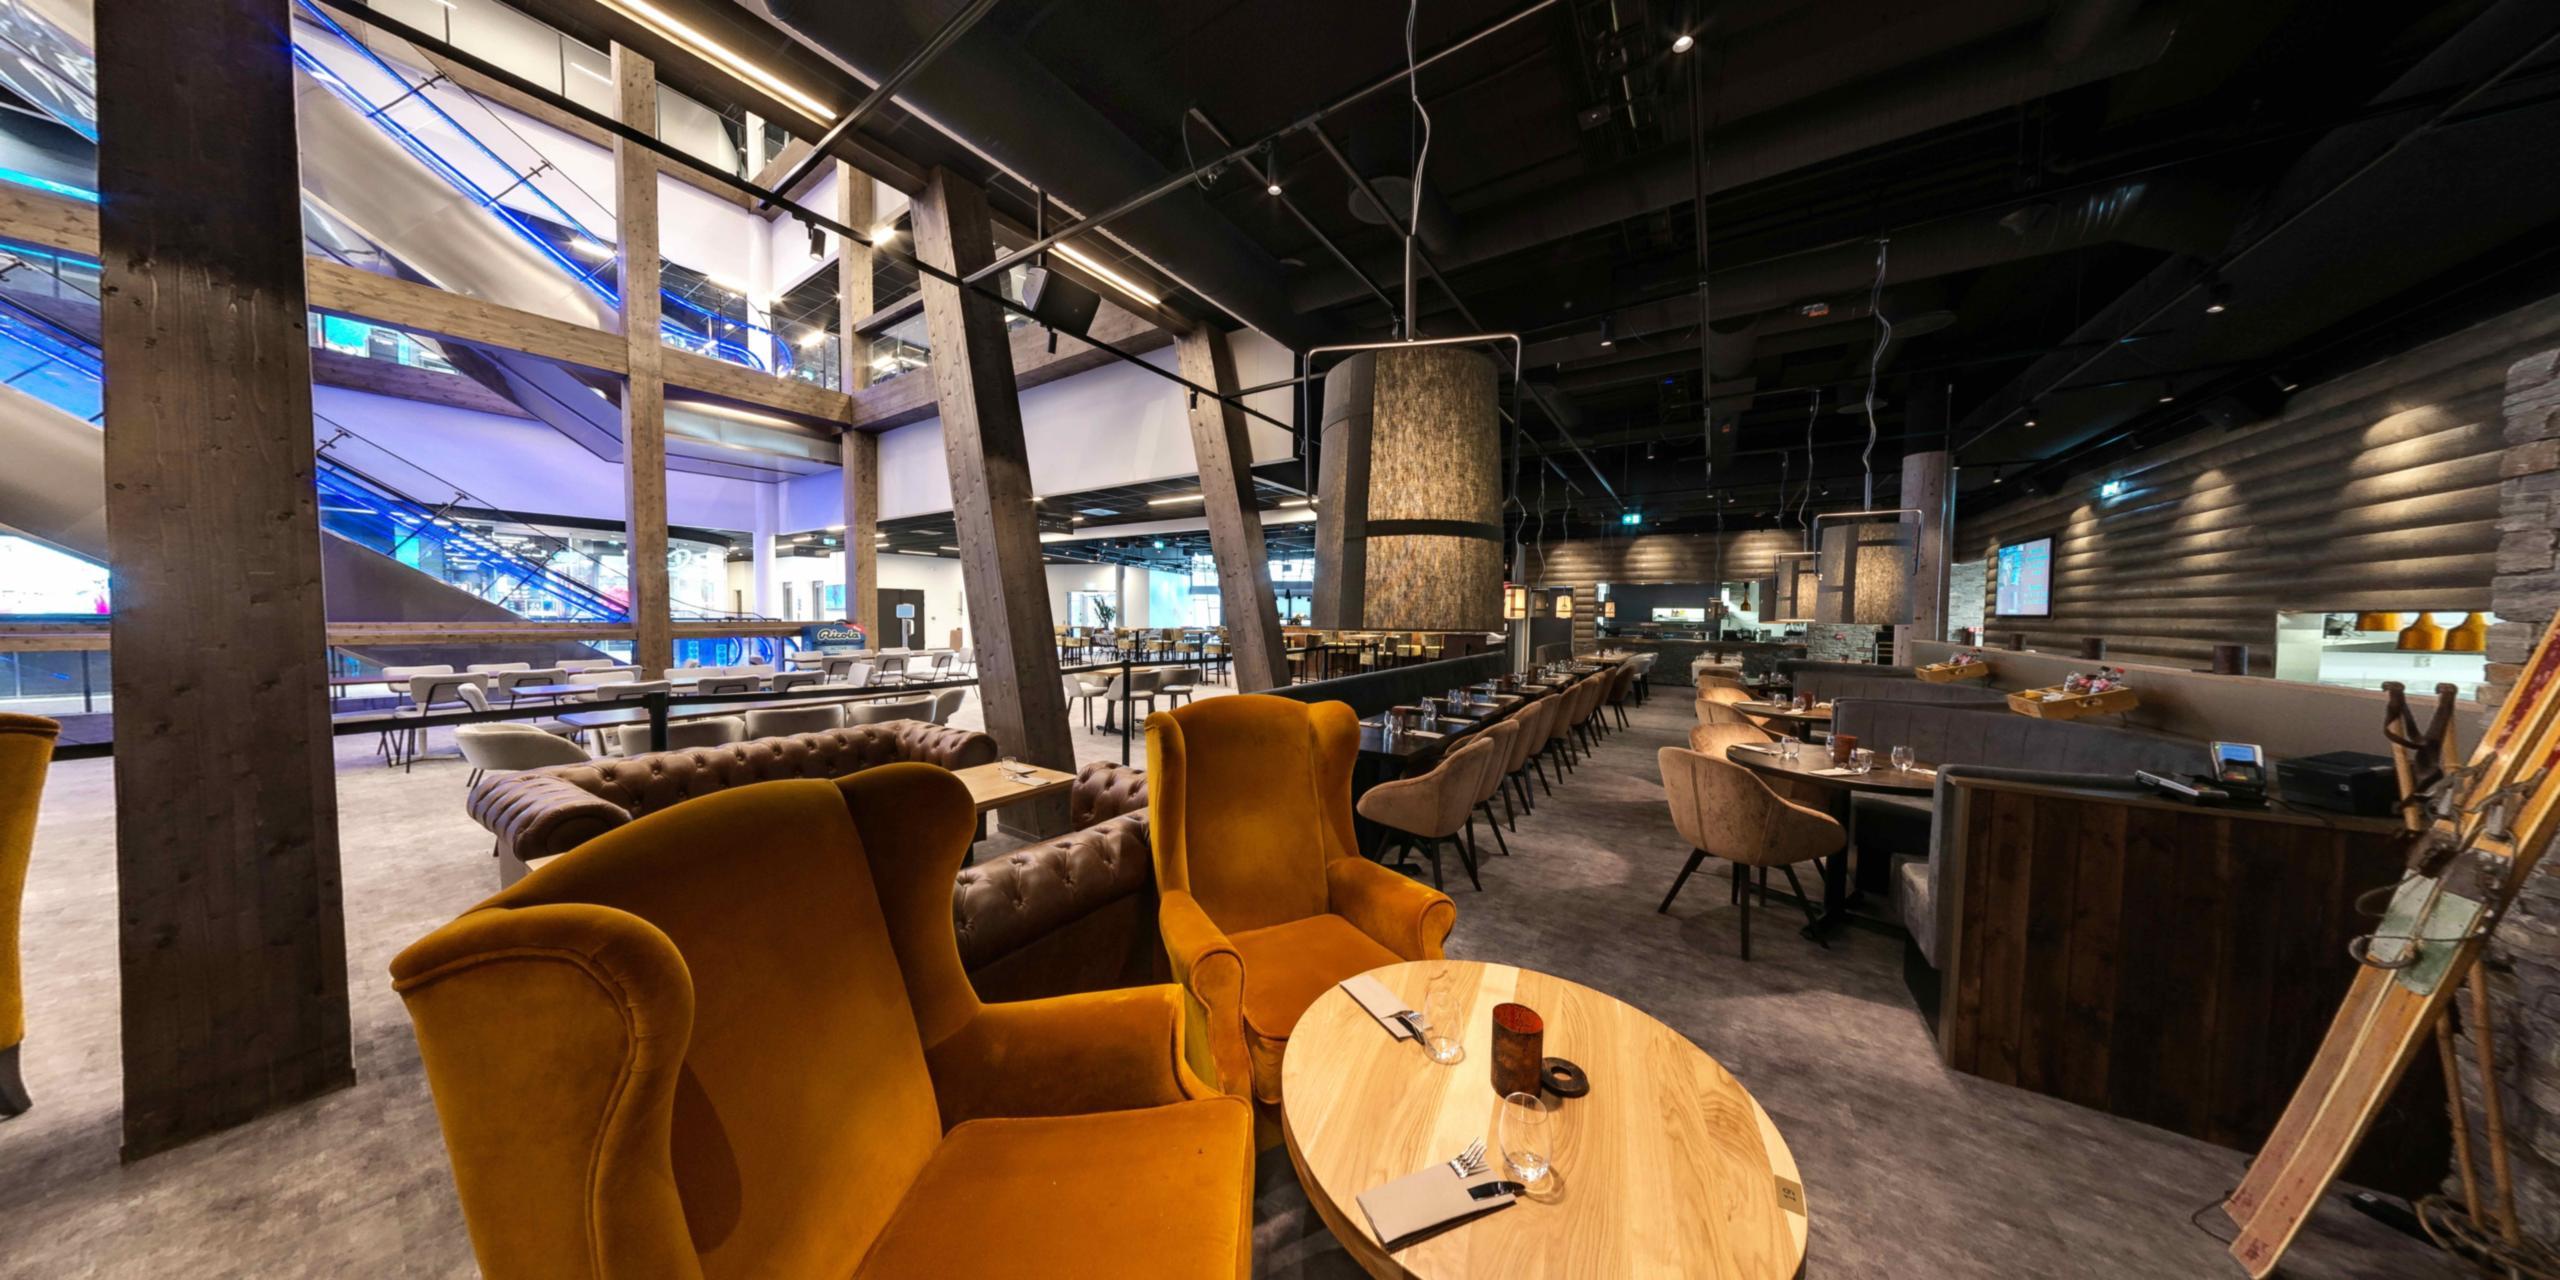 Restaurant in SNØ Oslo indoor ski centrum